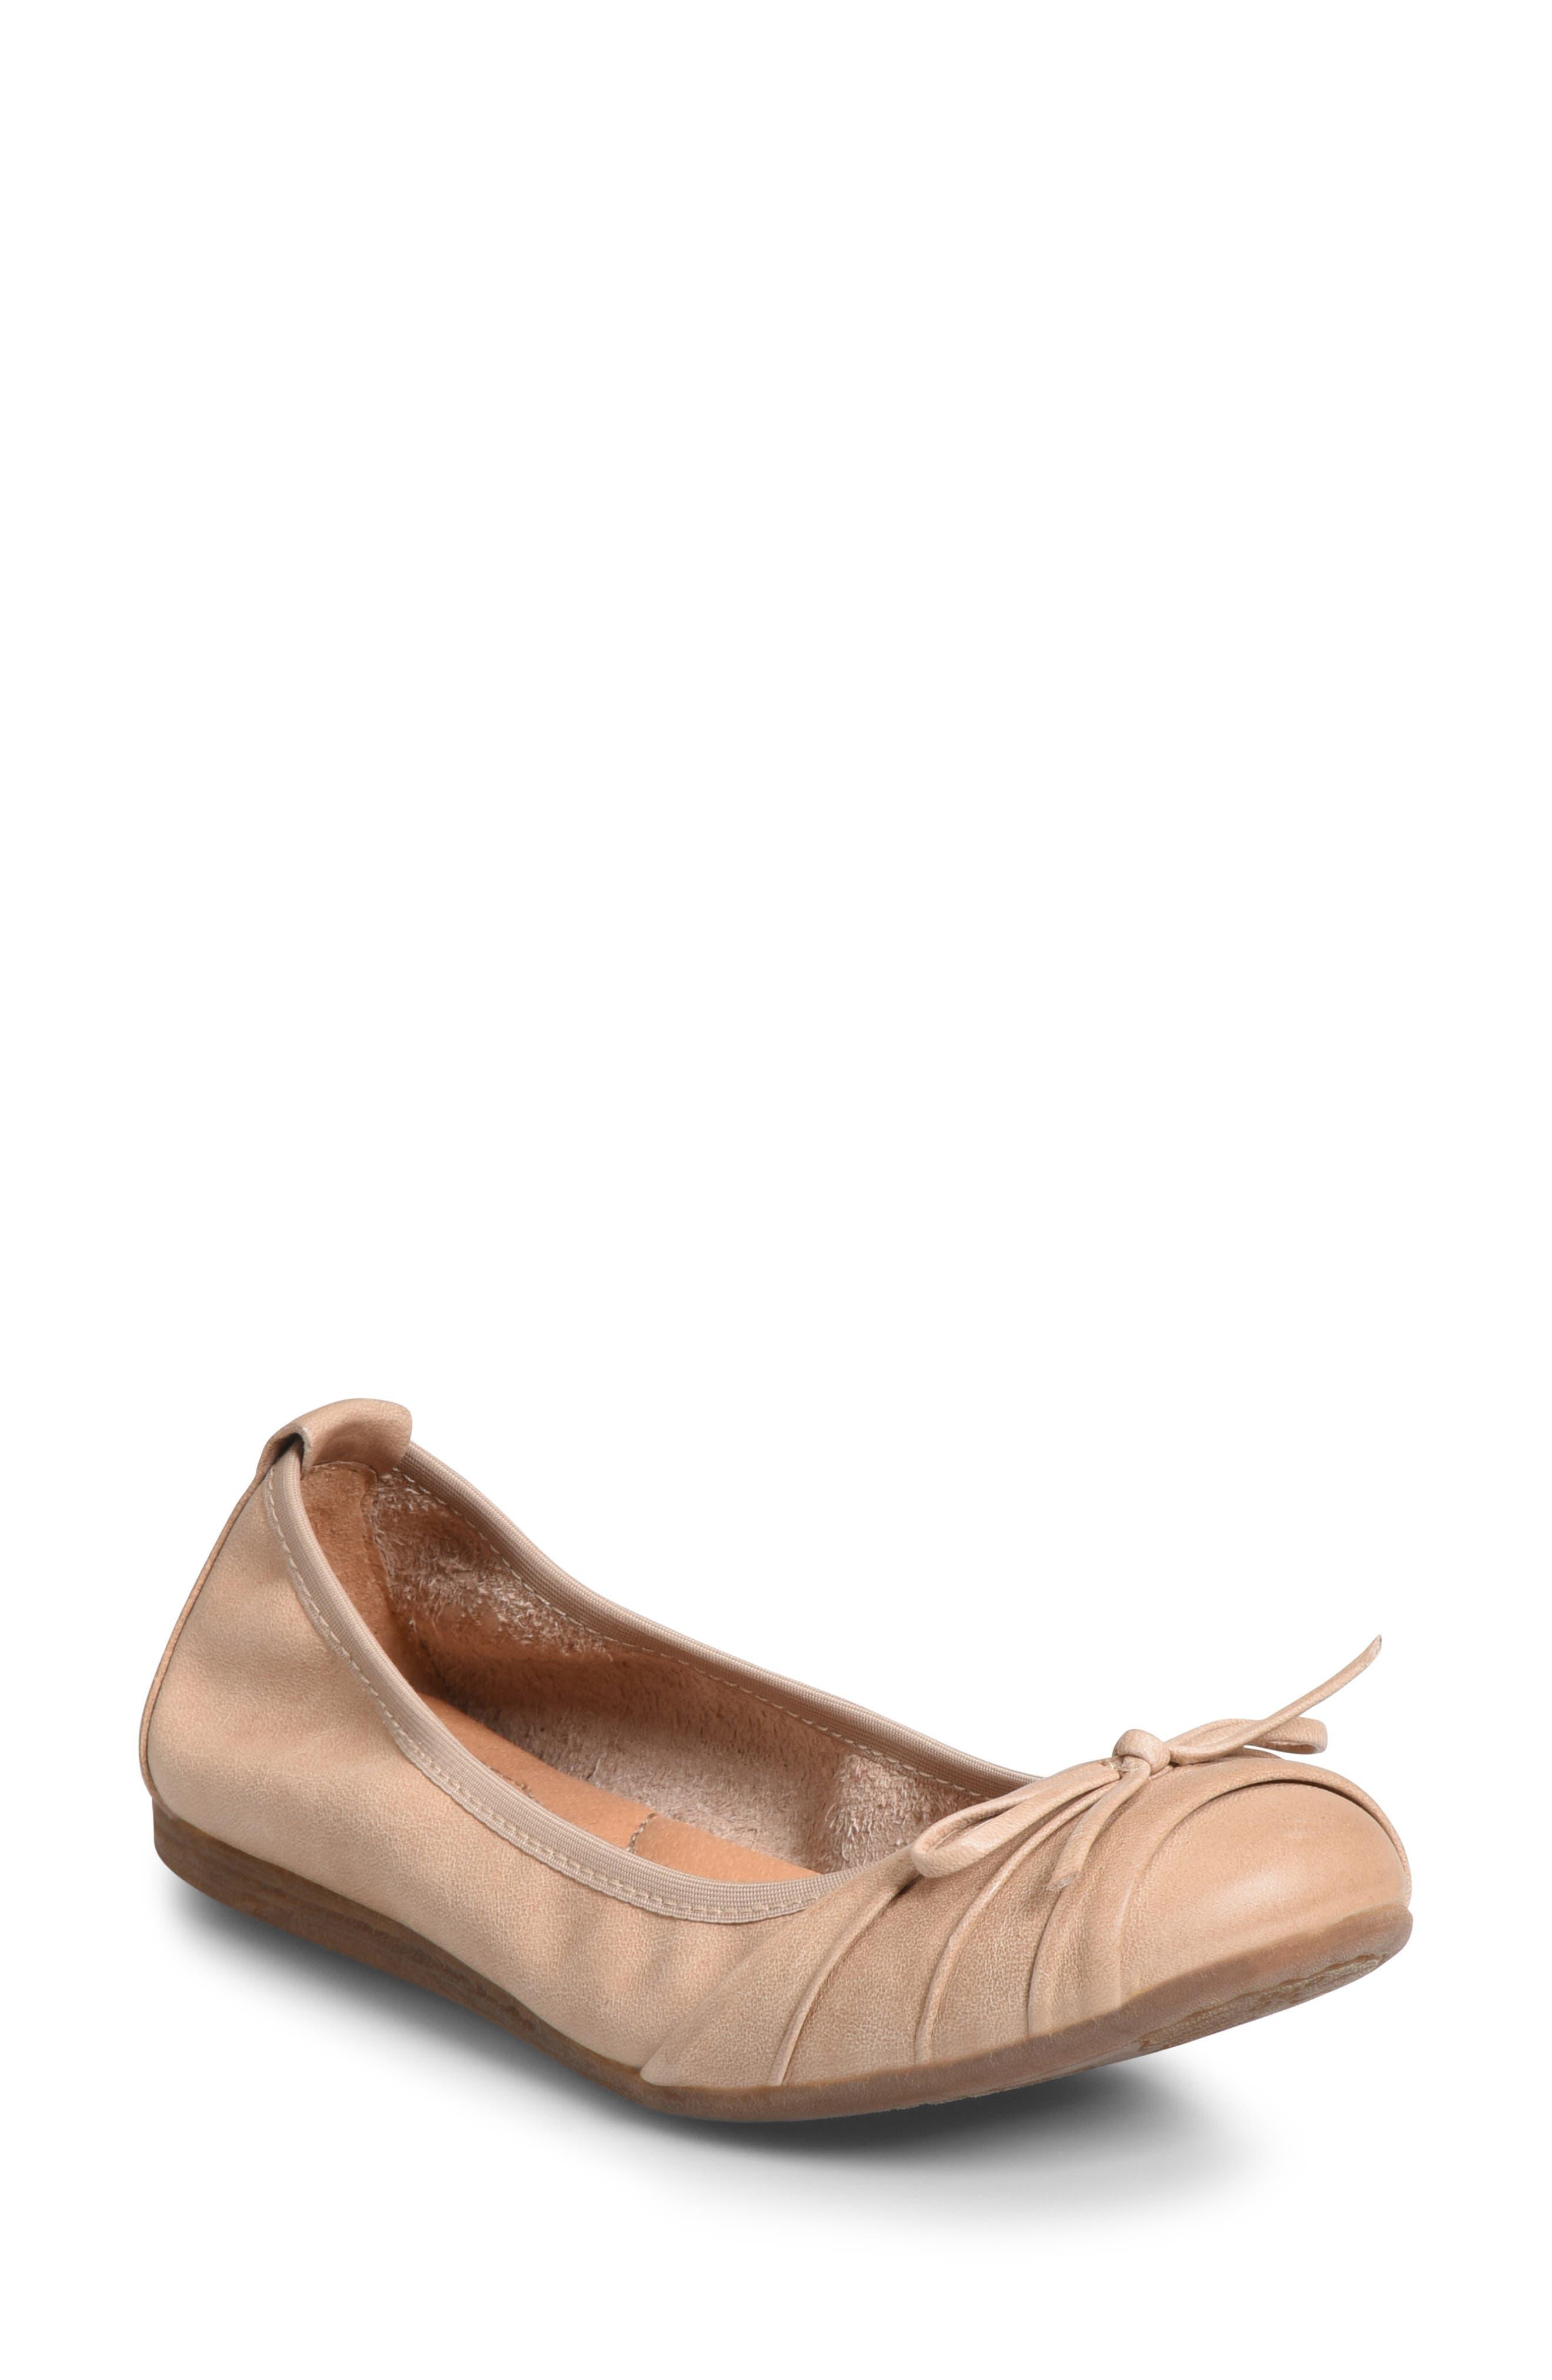 B?rn Chelan Ballet Flat- Beige